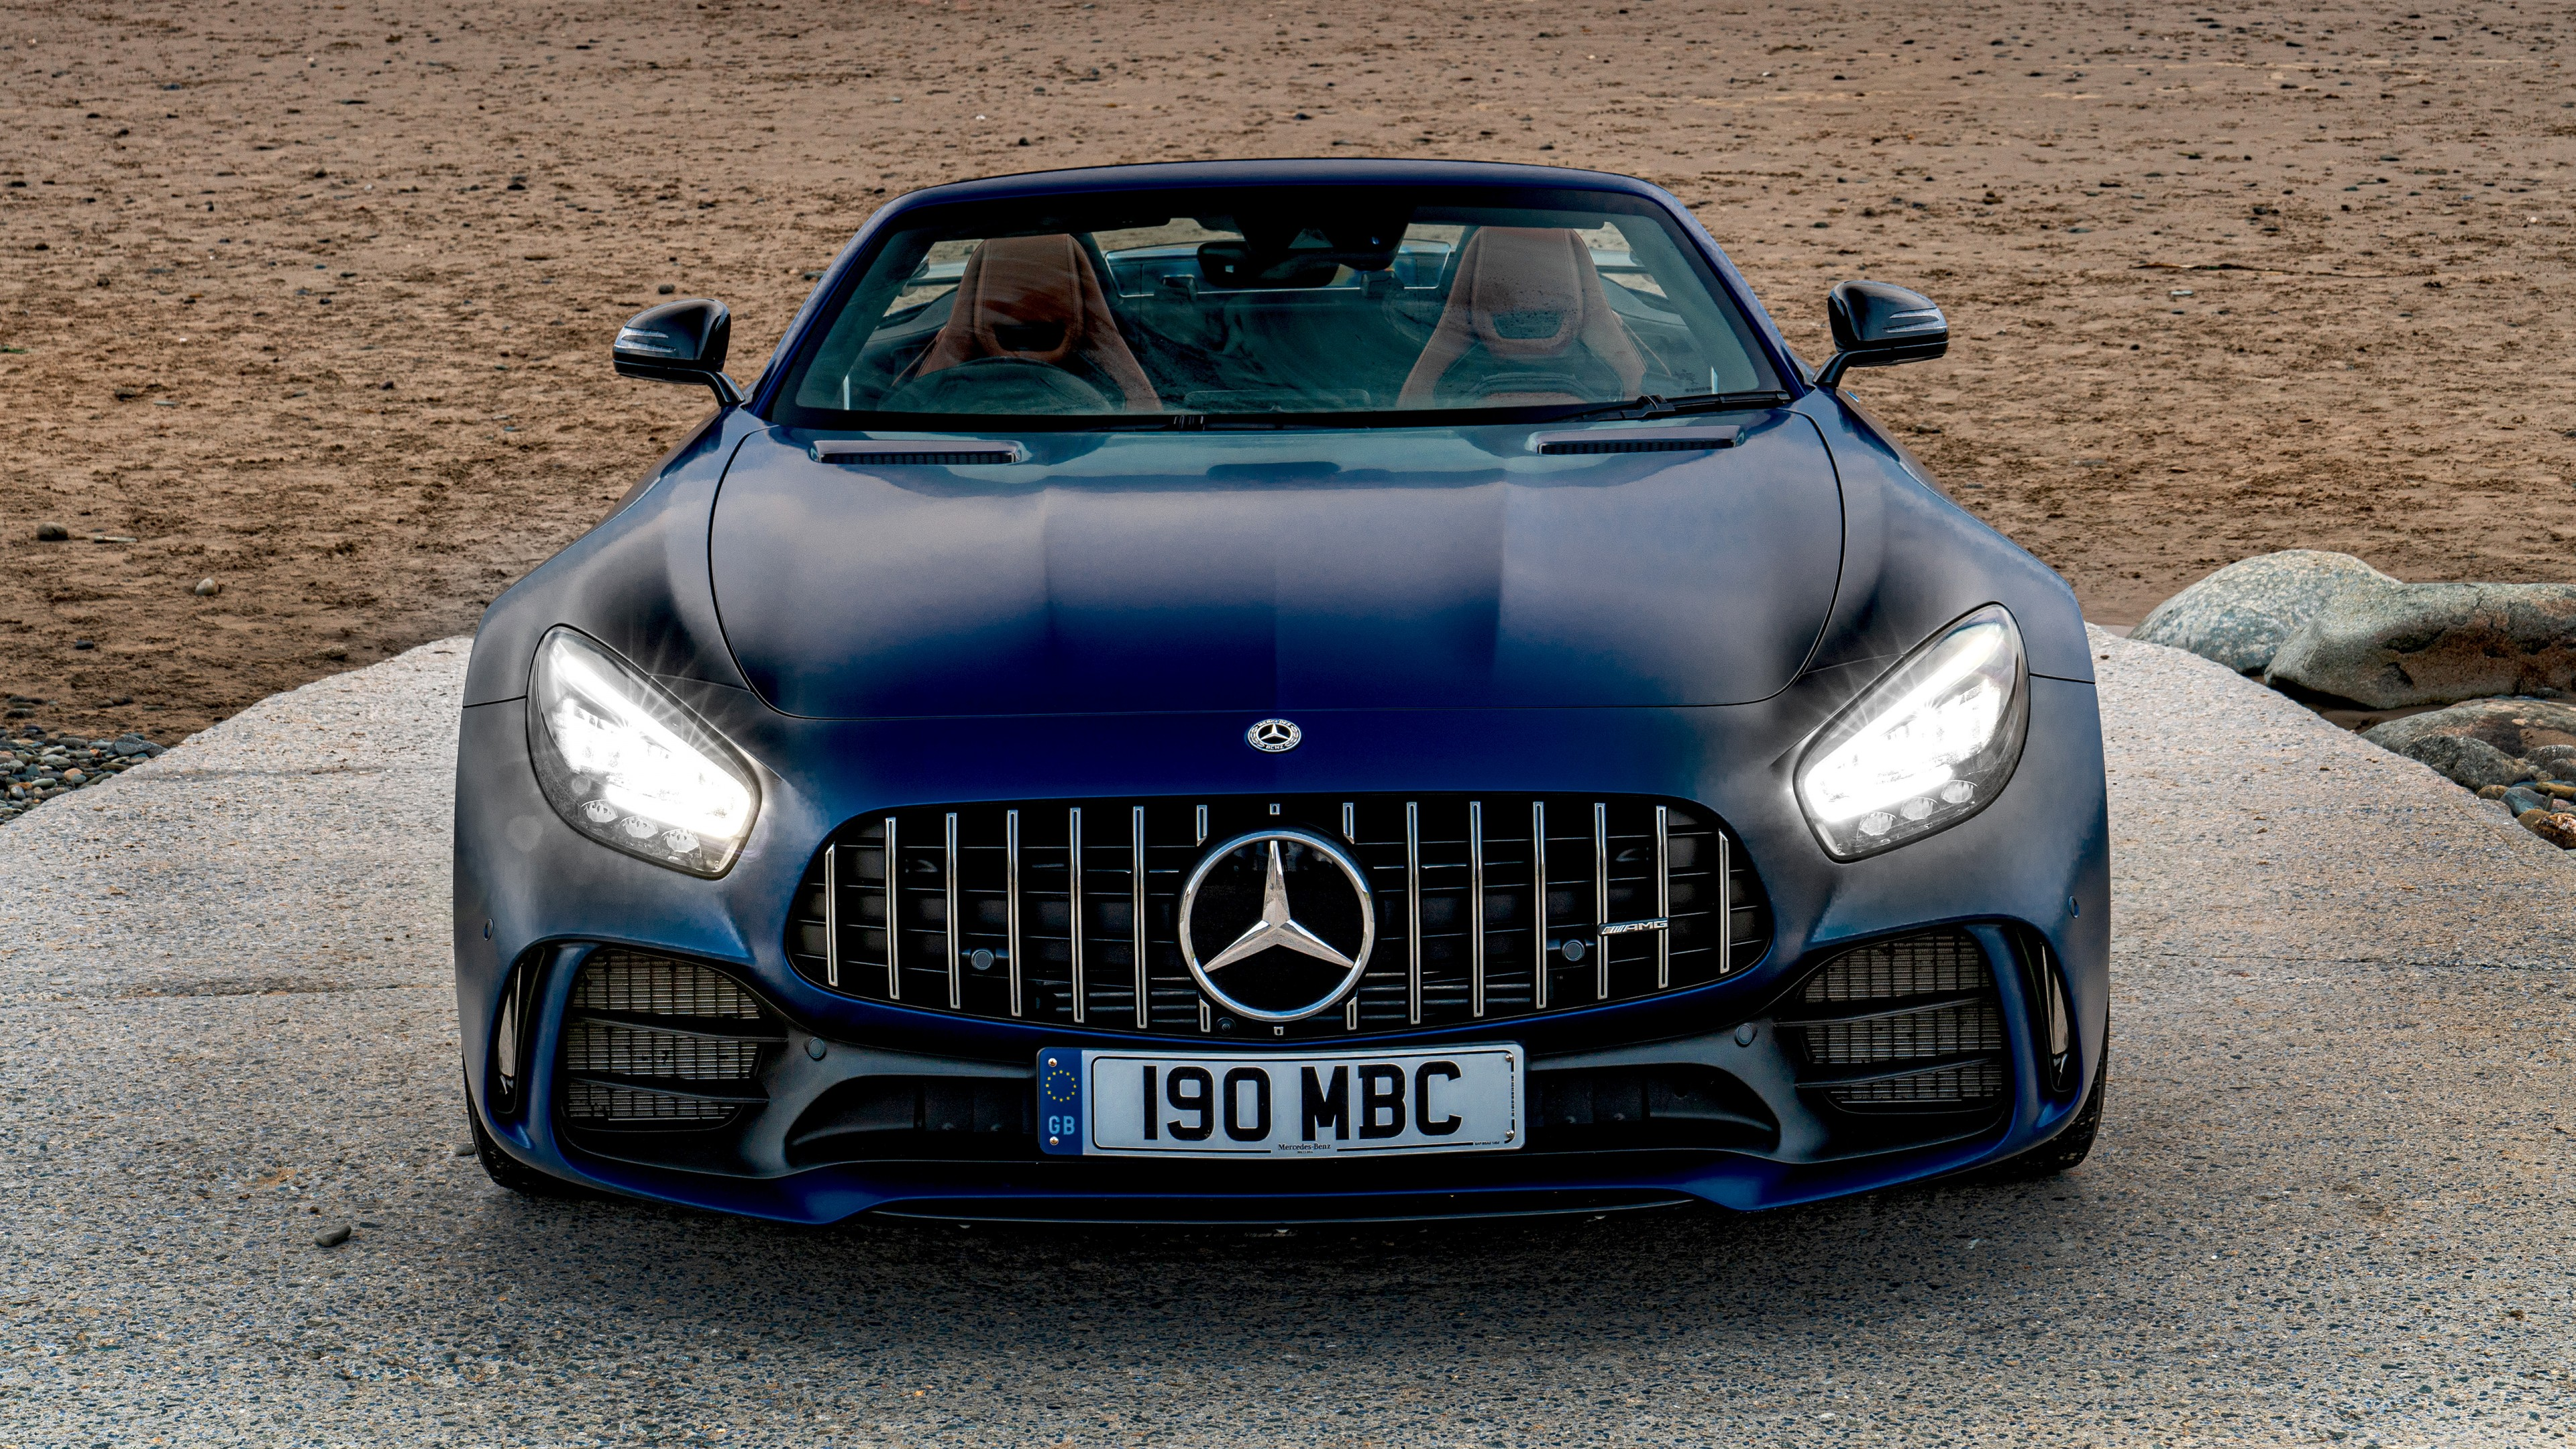 Mercedes Amg Gt R Roadster 2019 4k 3 Wallpaper Hd Car Wallpapers Id 13836